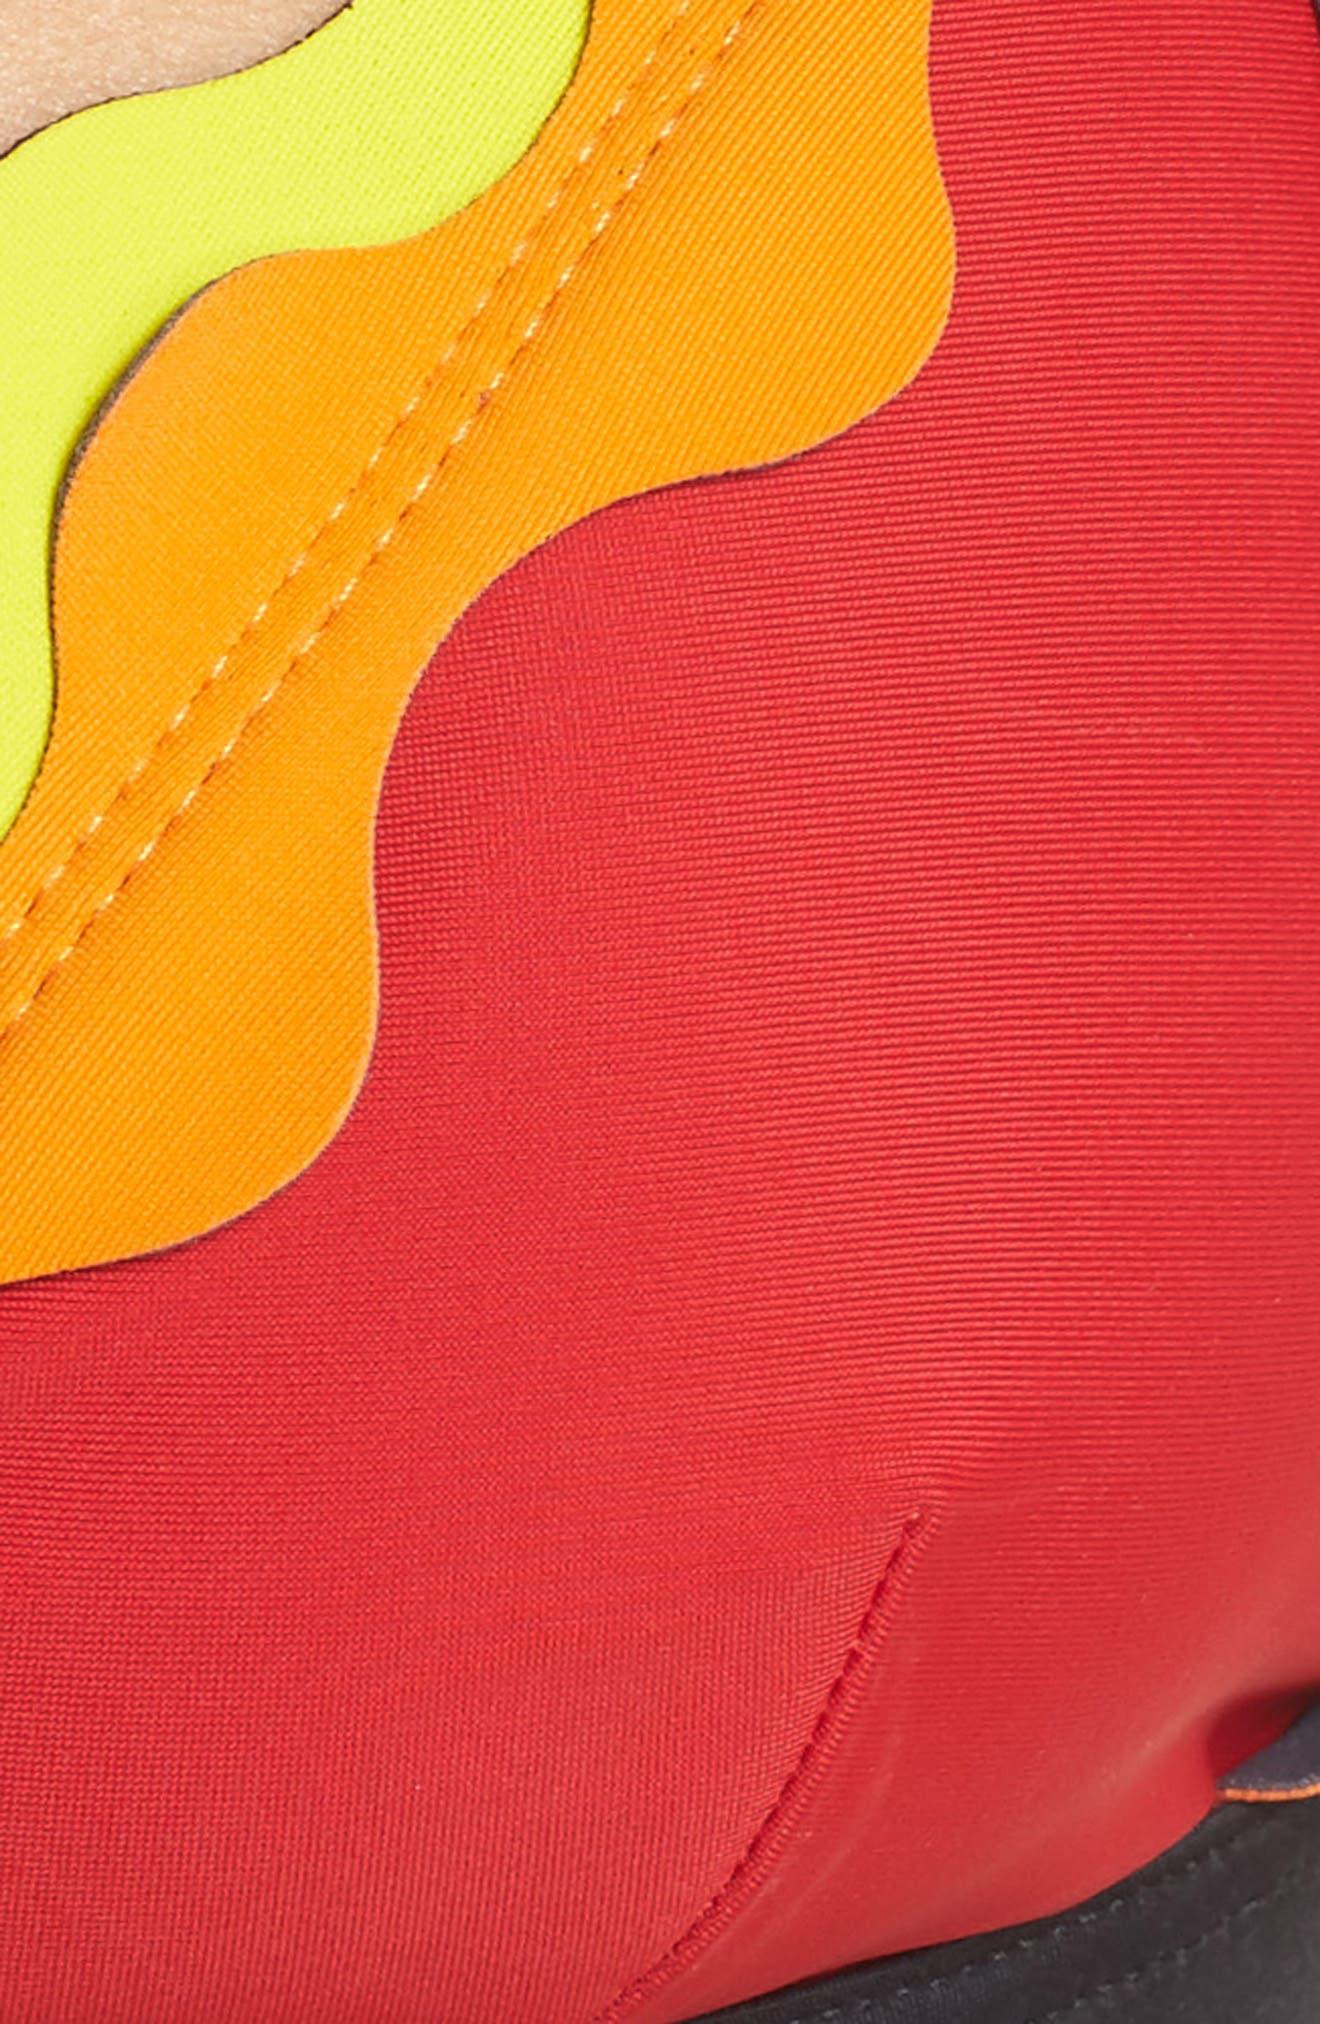 Cackle Scallop Bikini Top,                             Alternate thumbnail 8, color,                             Red